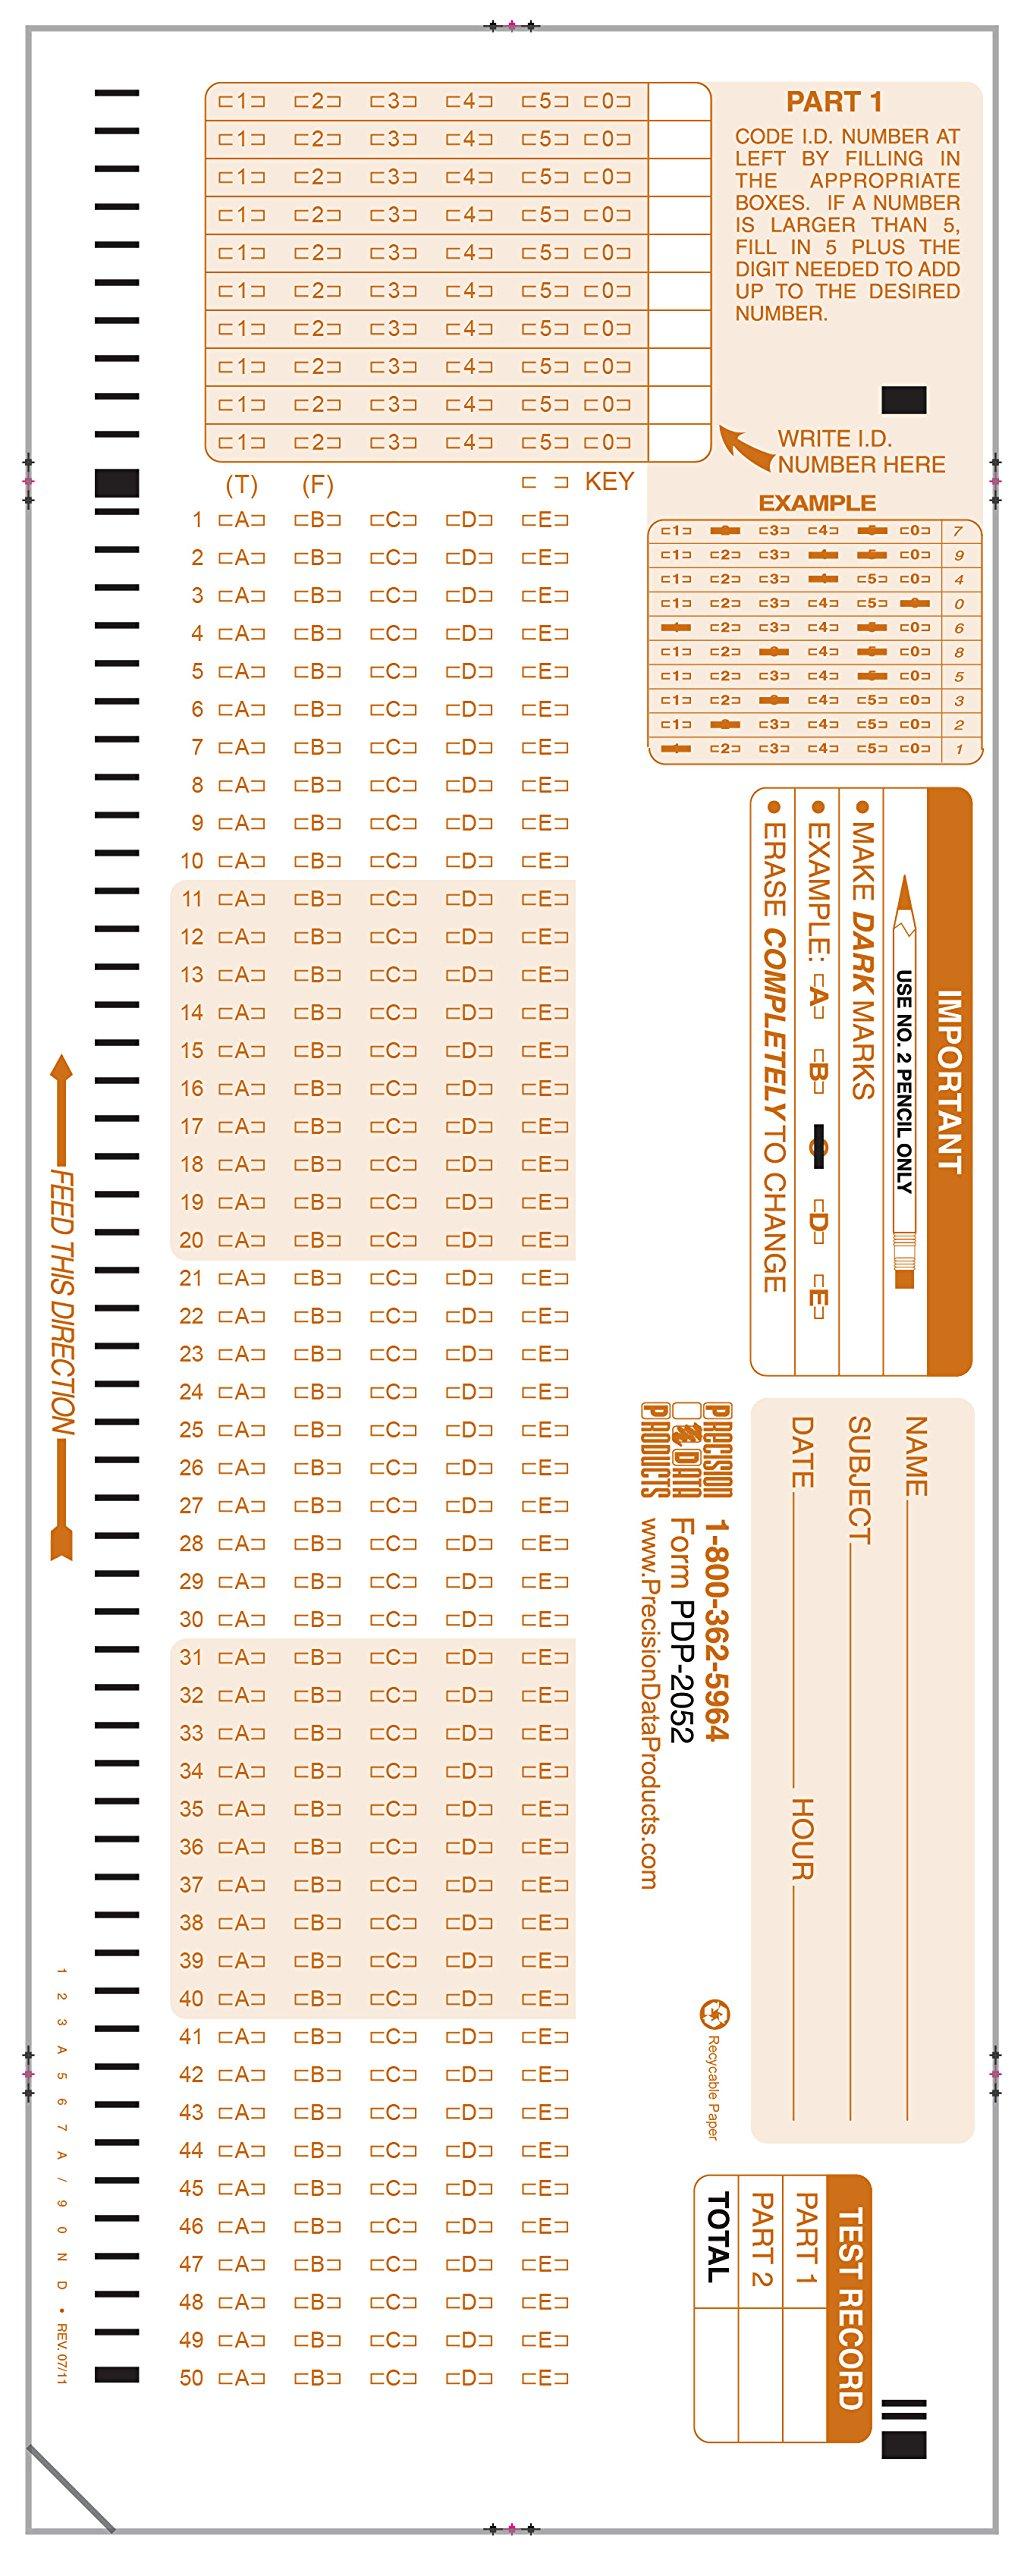 PDP-12052, 2052 C Compatible Test Sheet, (50/pkg)